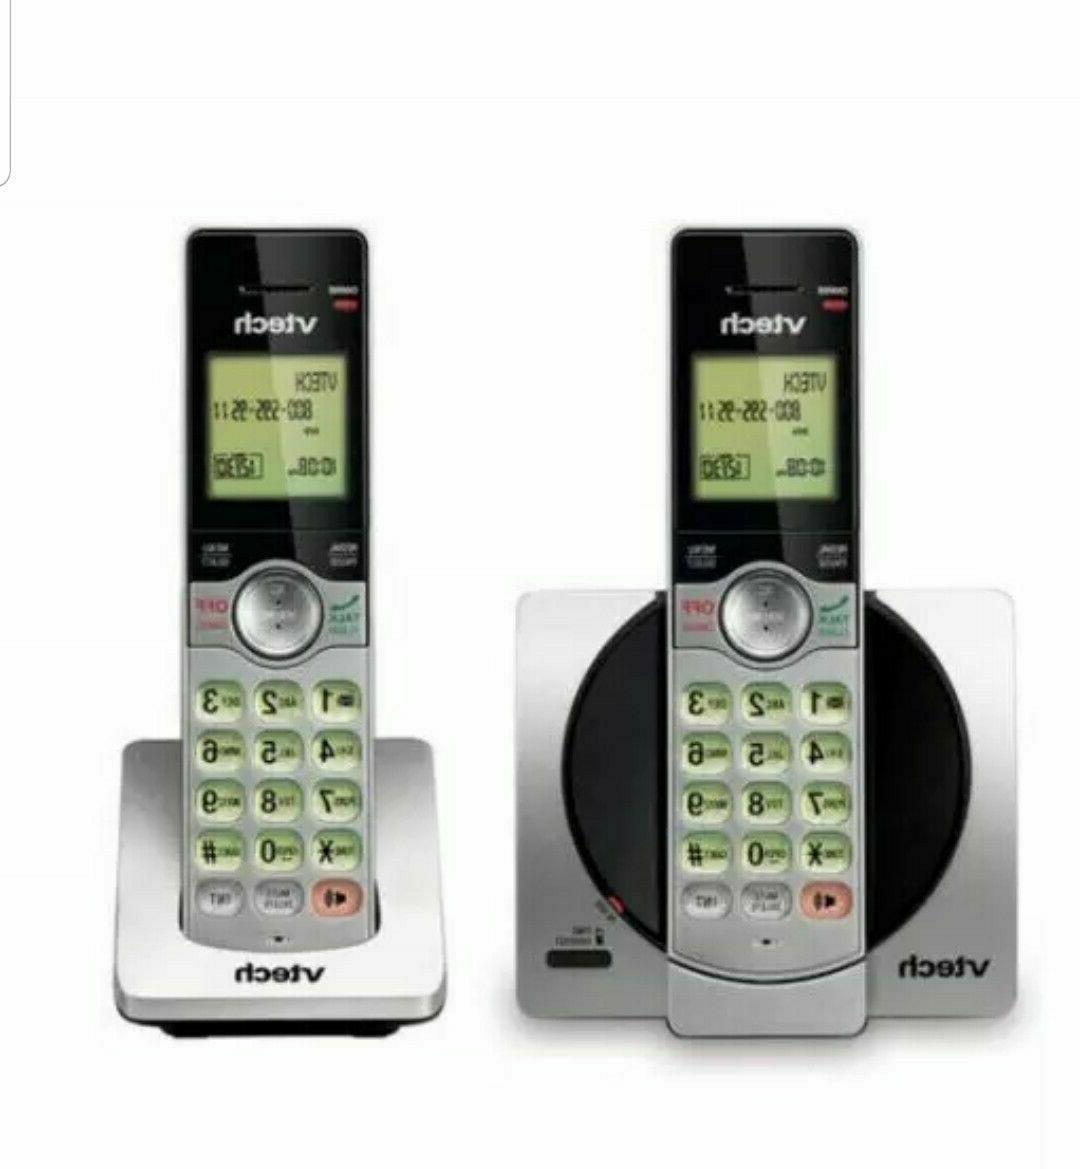 cs6919 2 2 handset cordless phone system